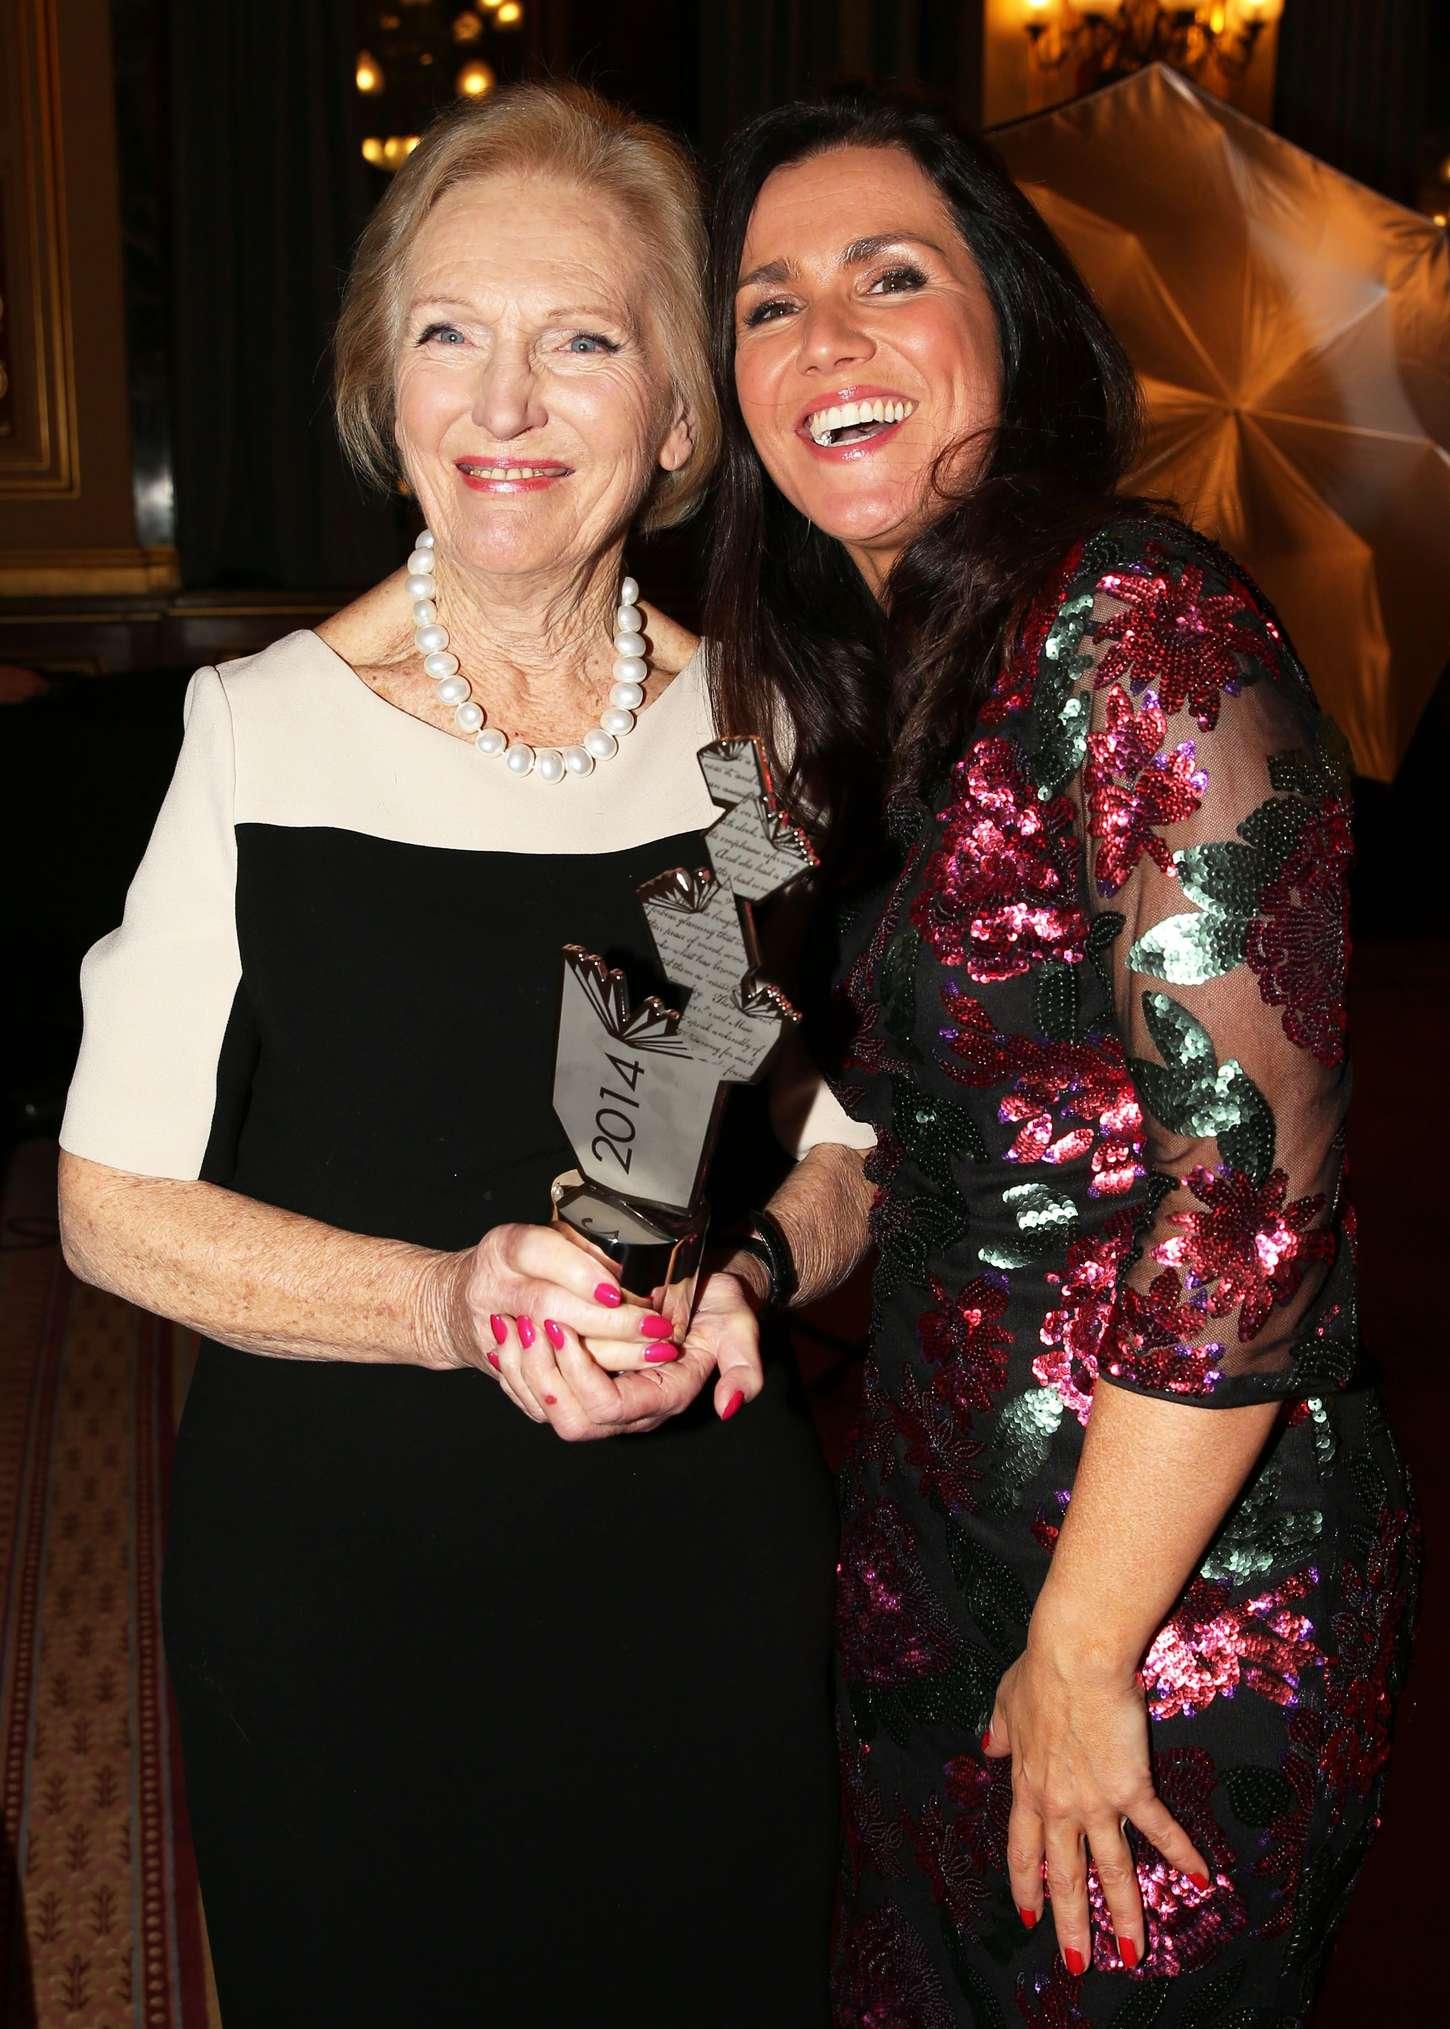 Susanna Reid Specsavers National Book Awards in London